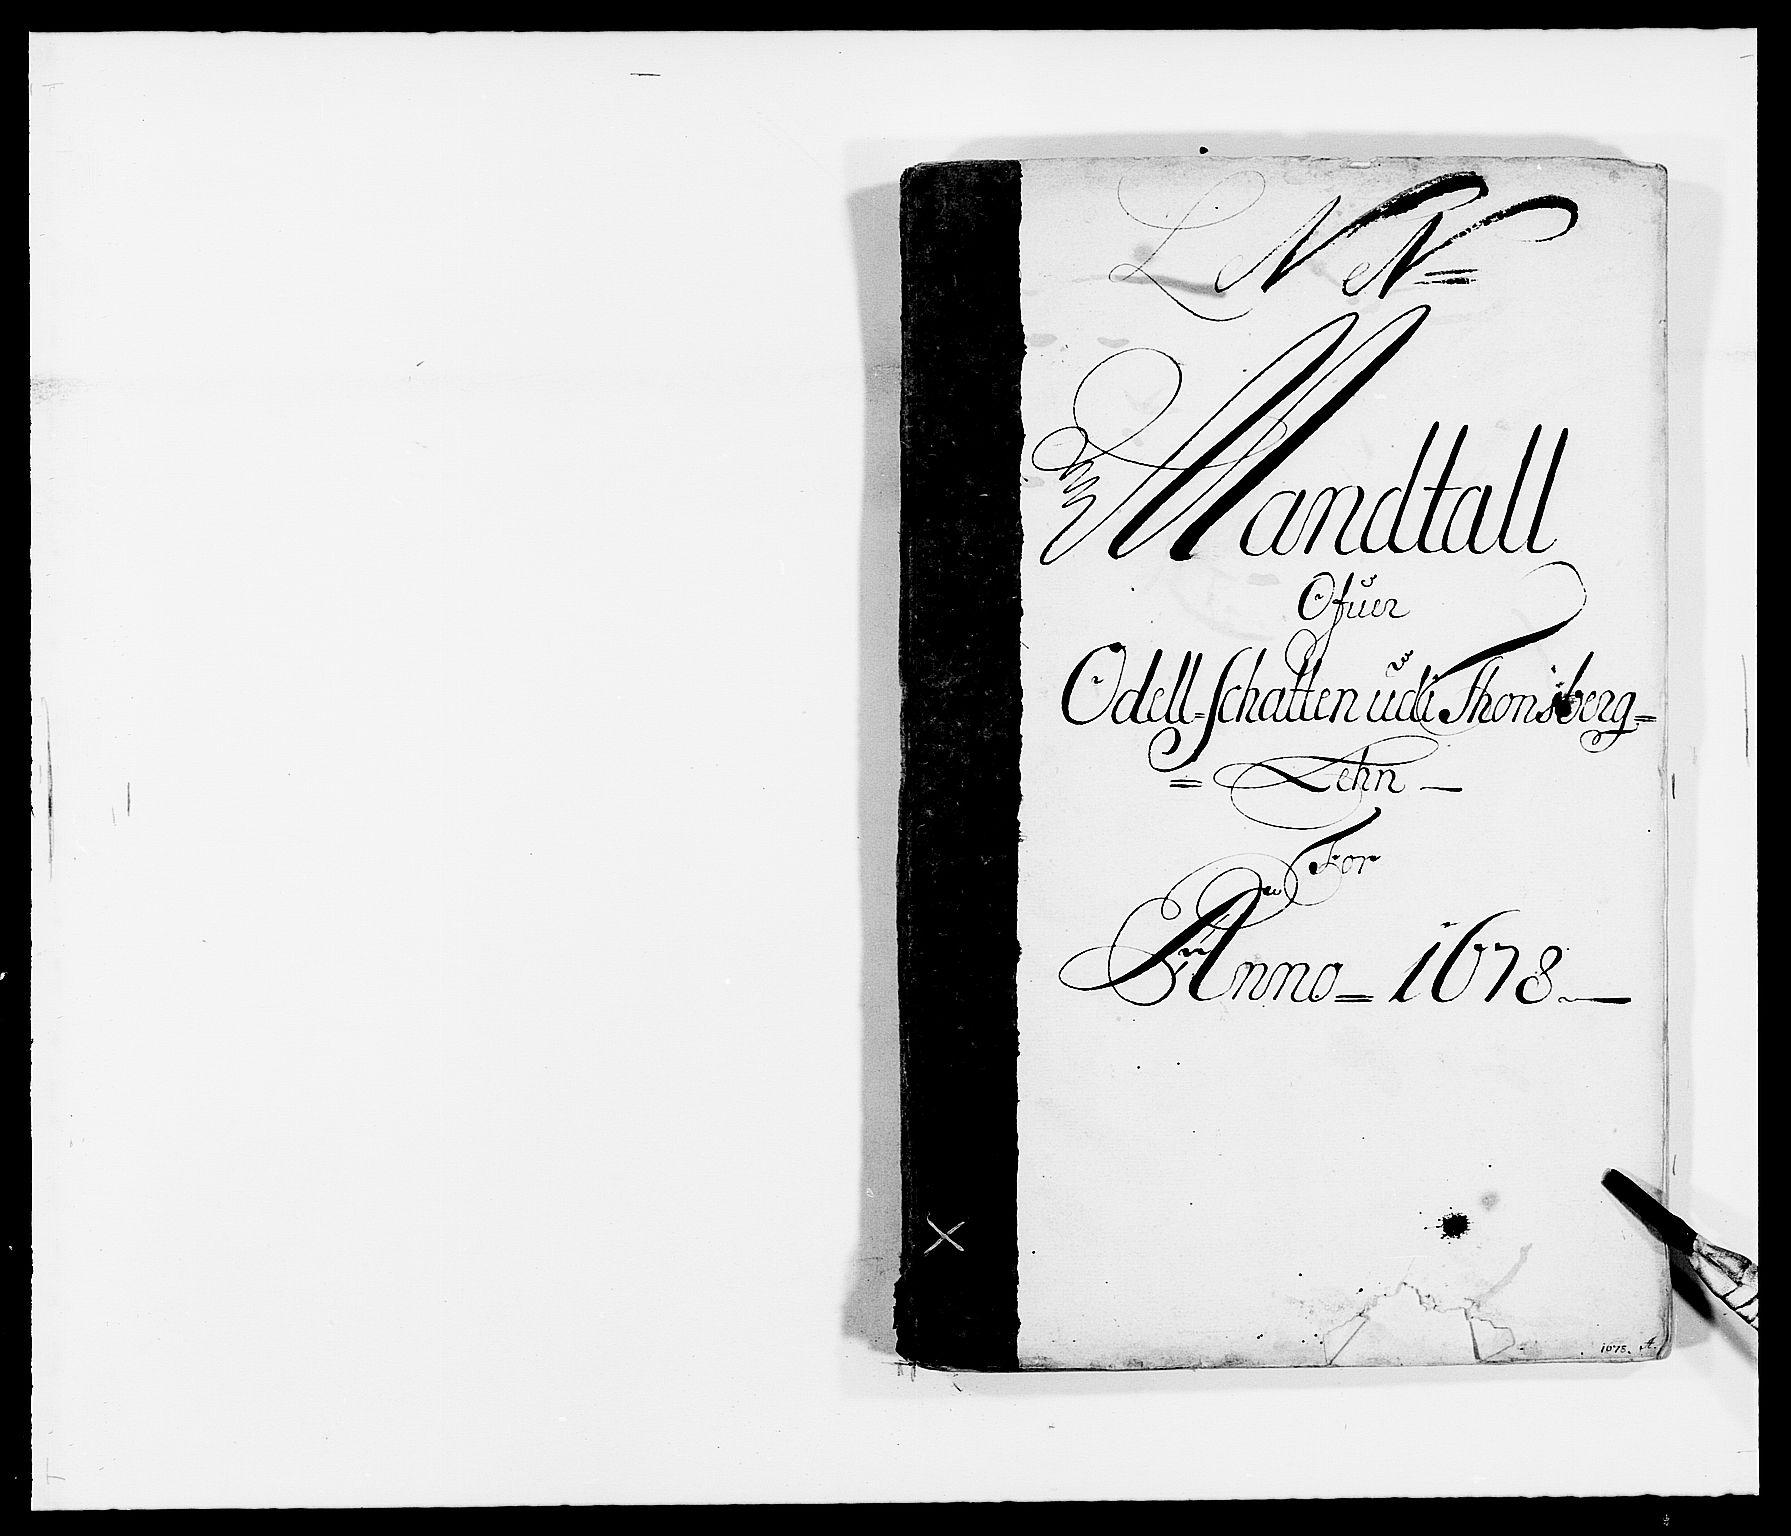 RA, Rentekammeret inntil 1814, Reviderte regnskaper, Fogderegnskap, R32/L1845: Fogderegnskap Jarlsberg grevskap, 1676-1678, s. 326